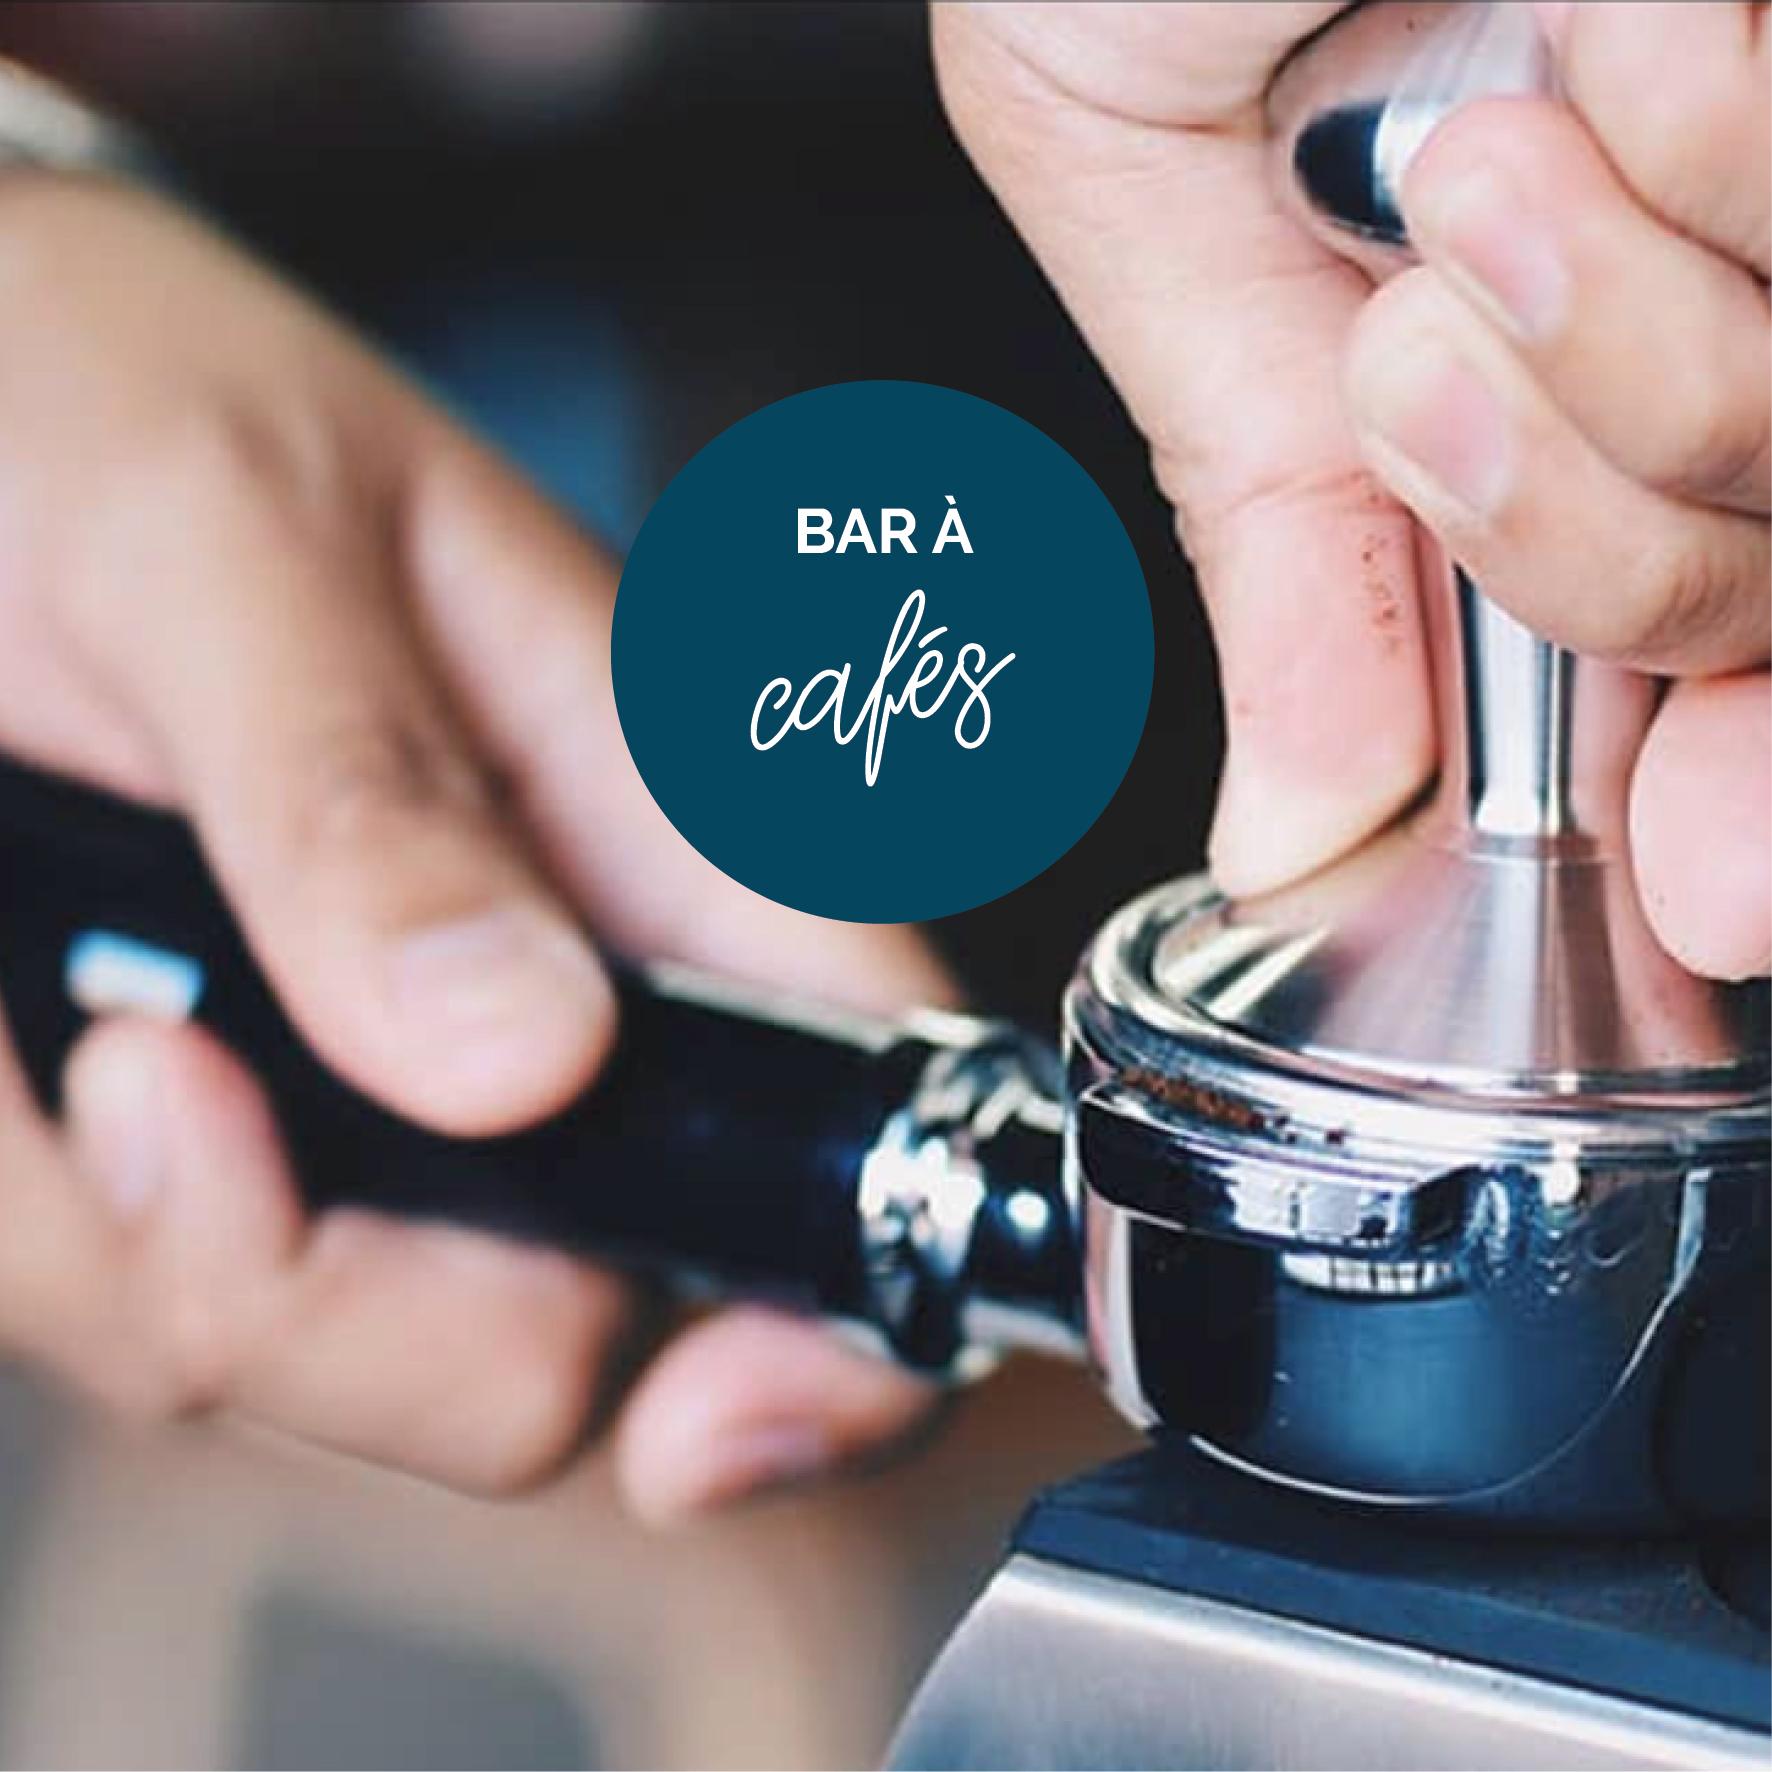 Bar à cafés